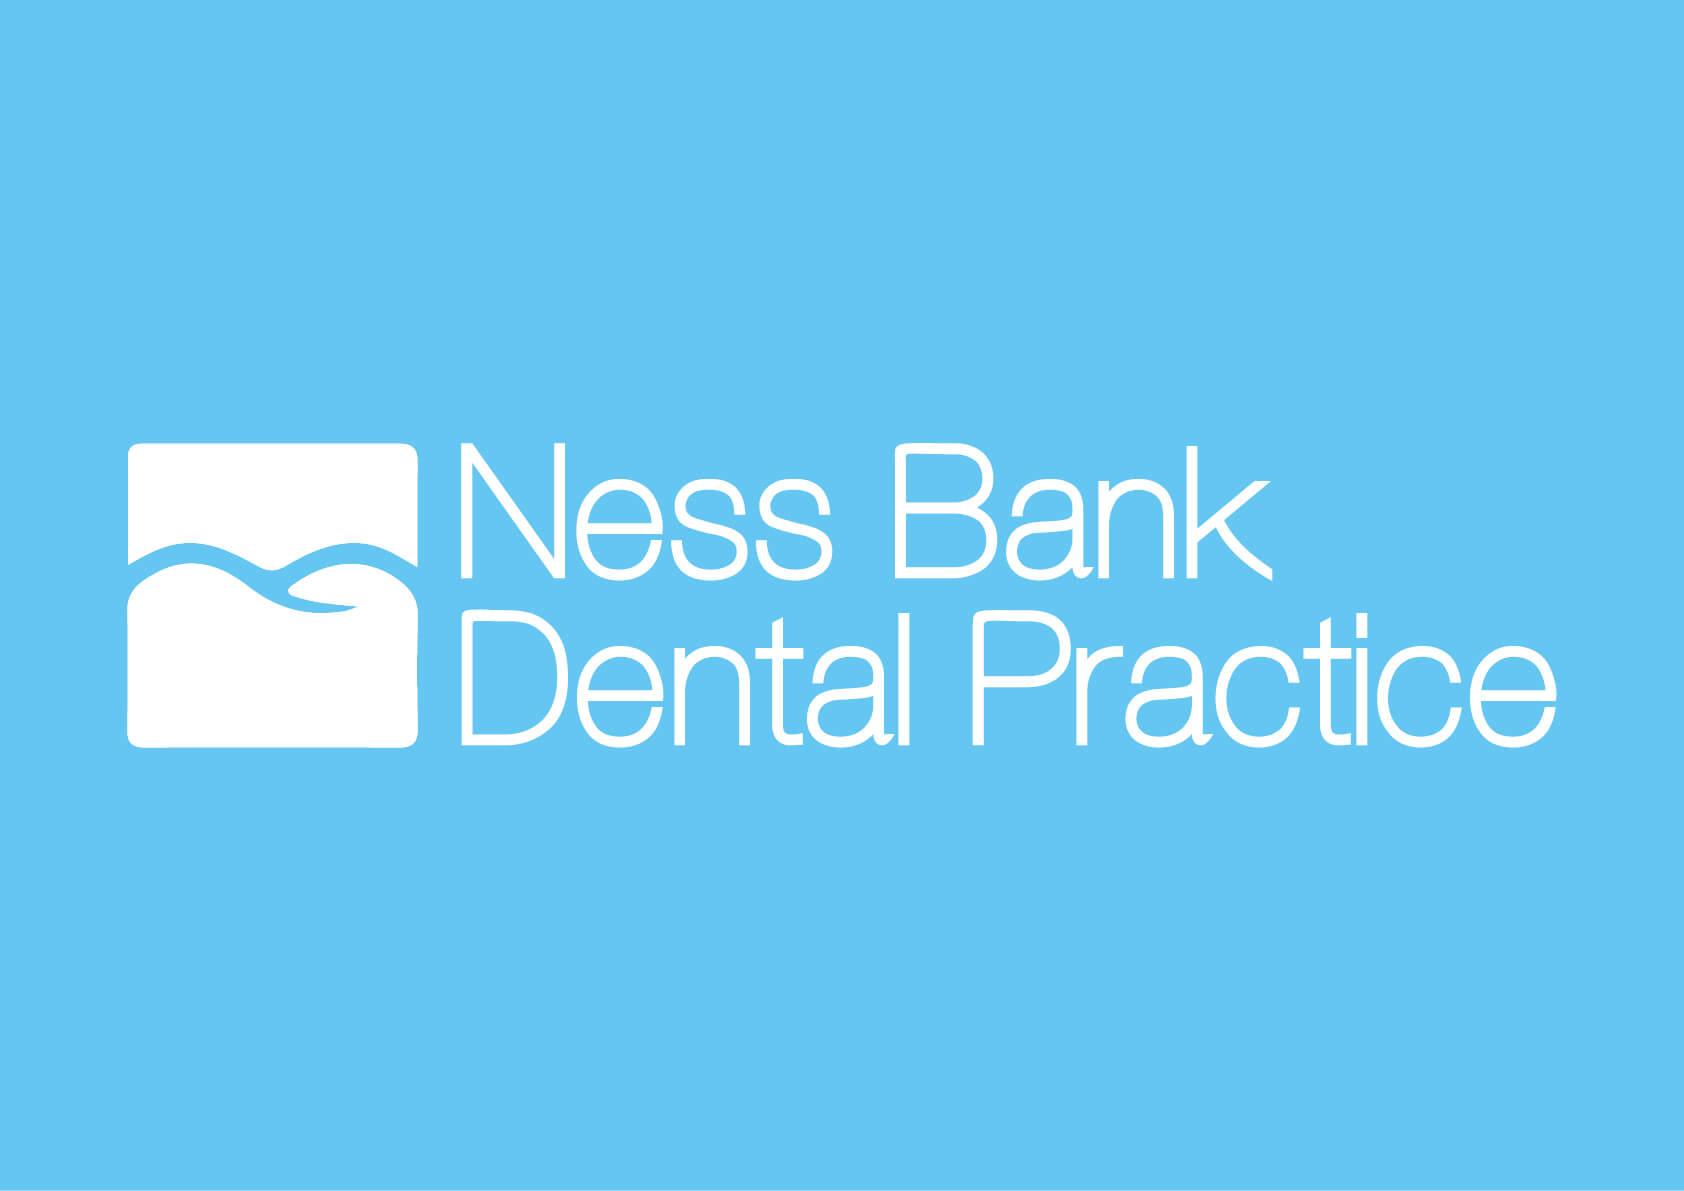 Nessbank Logo on Blue Background